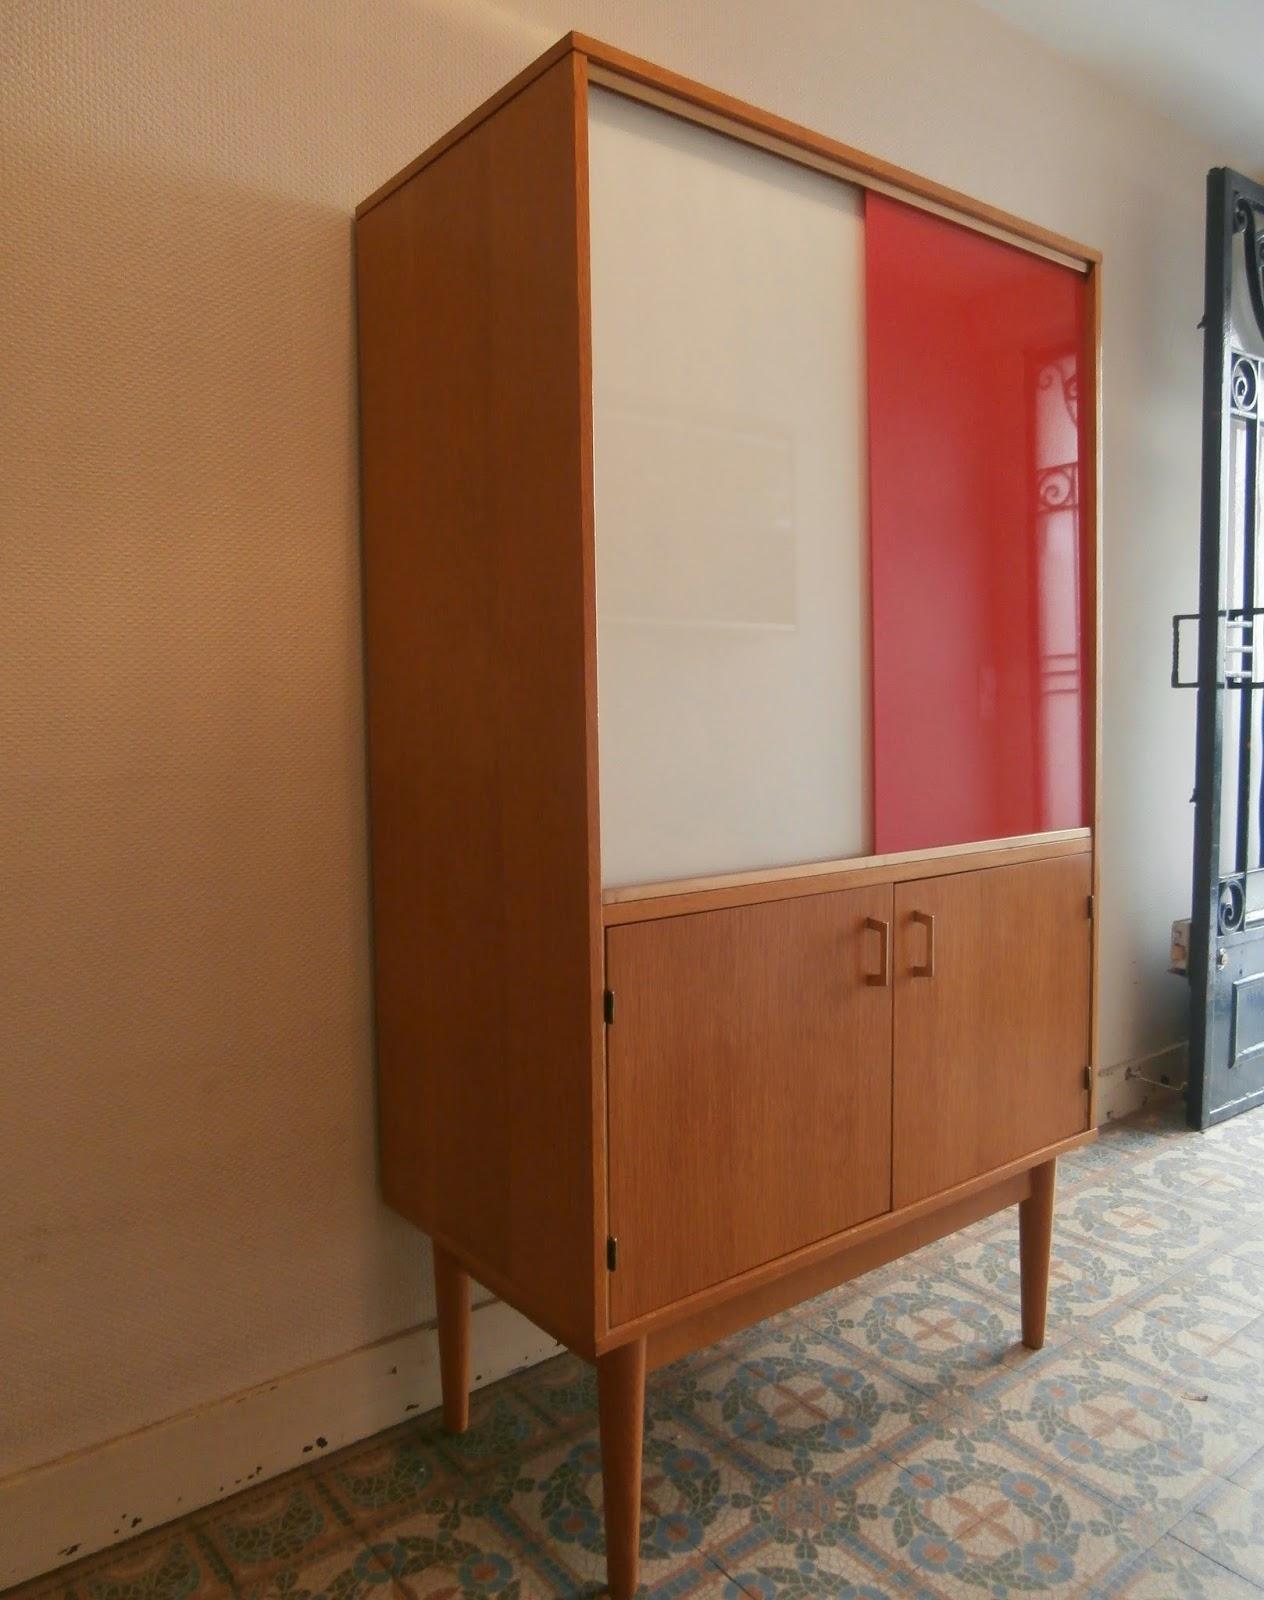 Dur e de vie ind termin e biblioth que vitrine bicolore - Duree de vie d un frigo ...